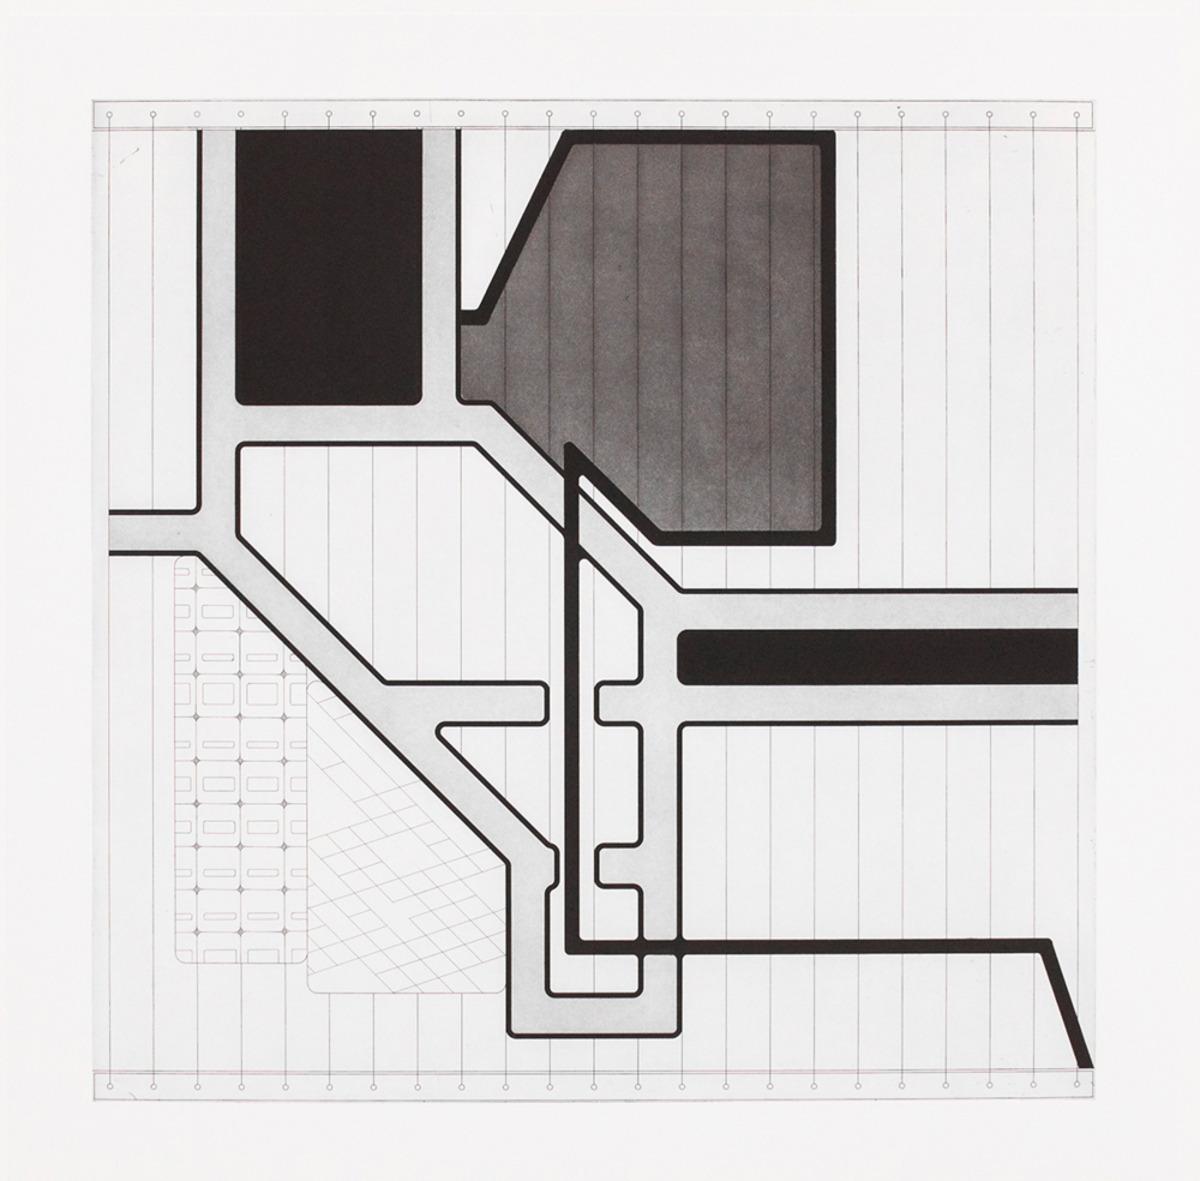 "Lemma II  ,  2015  Hard Ground Etching and Aquatint, Revere Silk 300gsm   Edition 21/25   27.5"" x 17.25""       Durham Press"